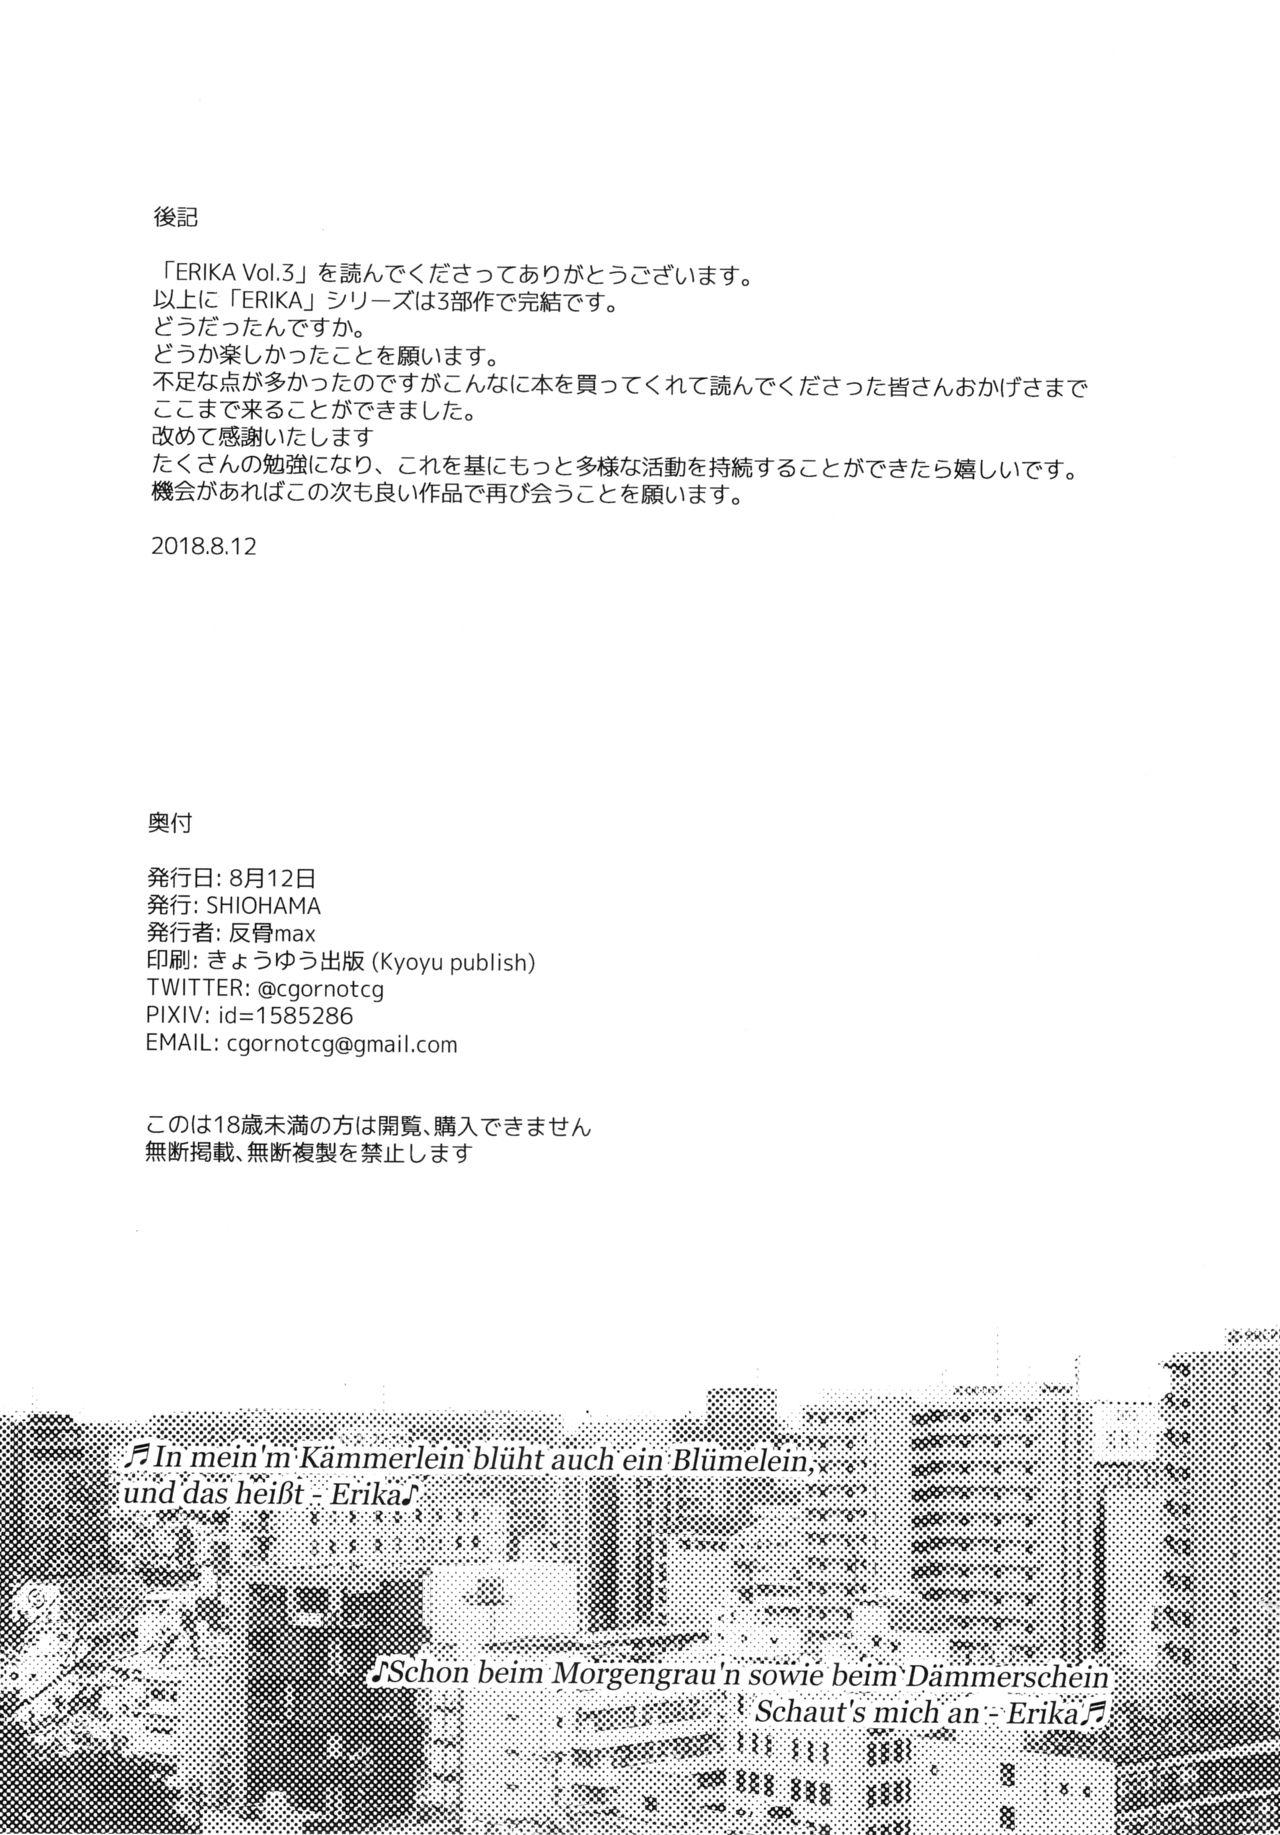 ERIKA Vol. 3 61